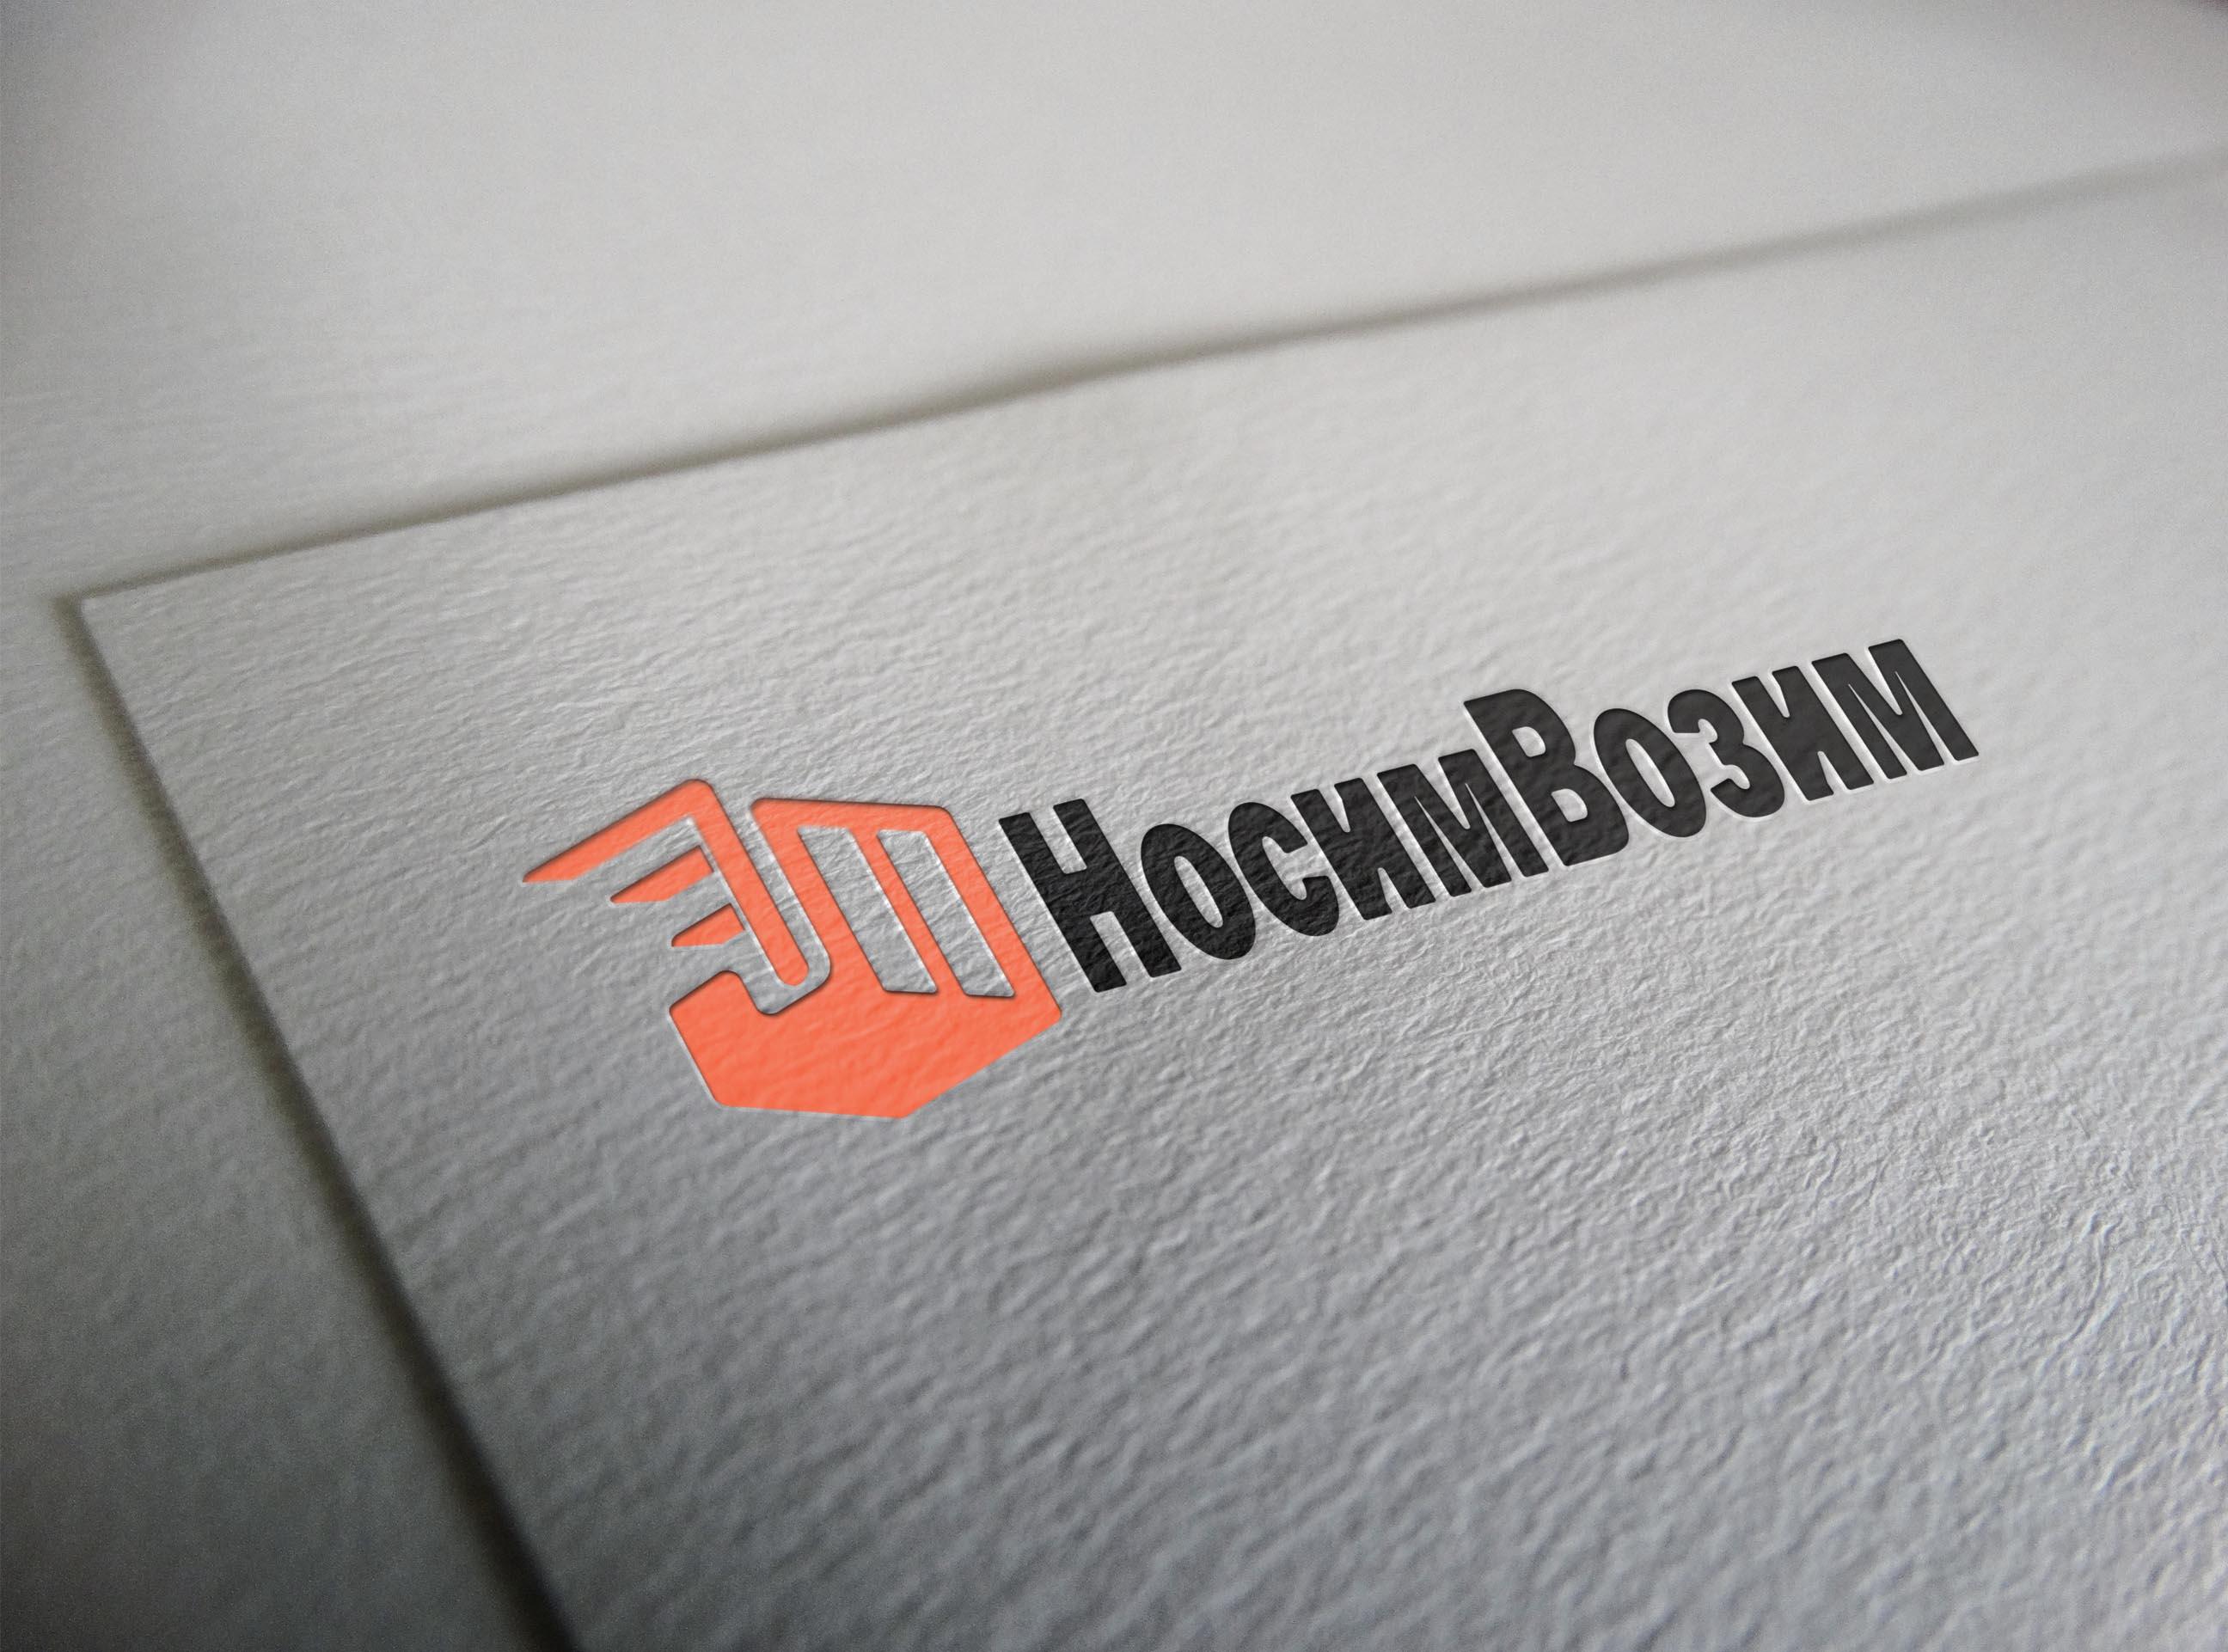 Логотип компании по перевозкам НосимВозим фото f_6985cfa7e11626e3.jpg